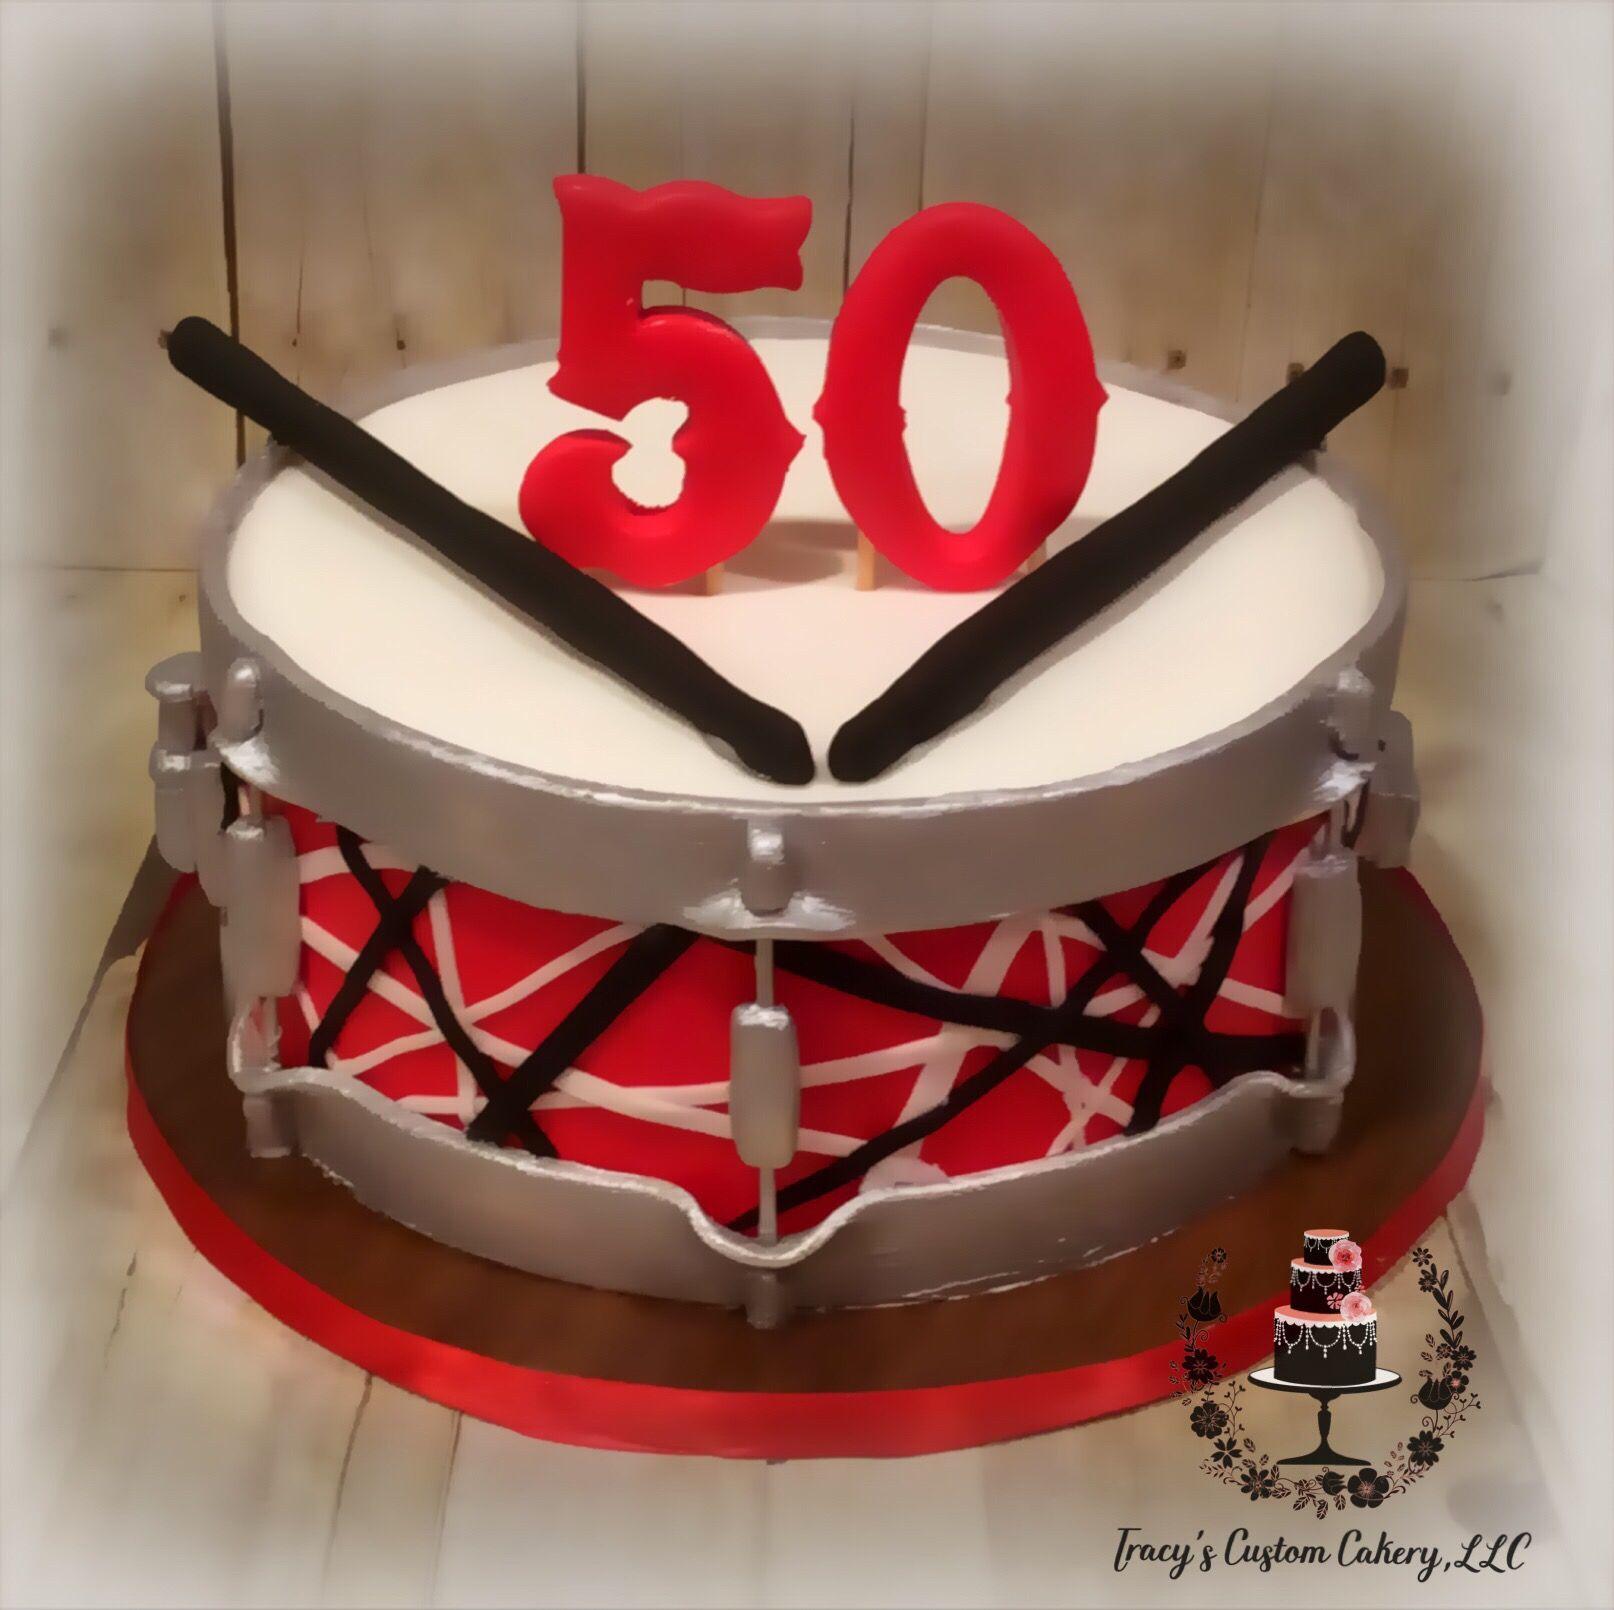 Pin By Tracy S Custom Cakery Llc On Milestone Birthday Cakes Cake Drum Cake Desserts